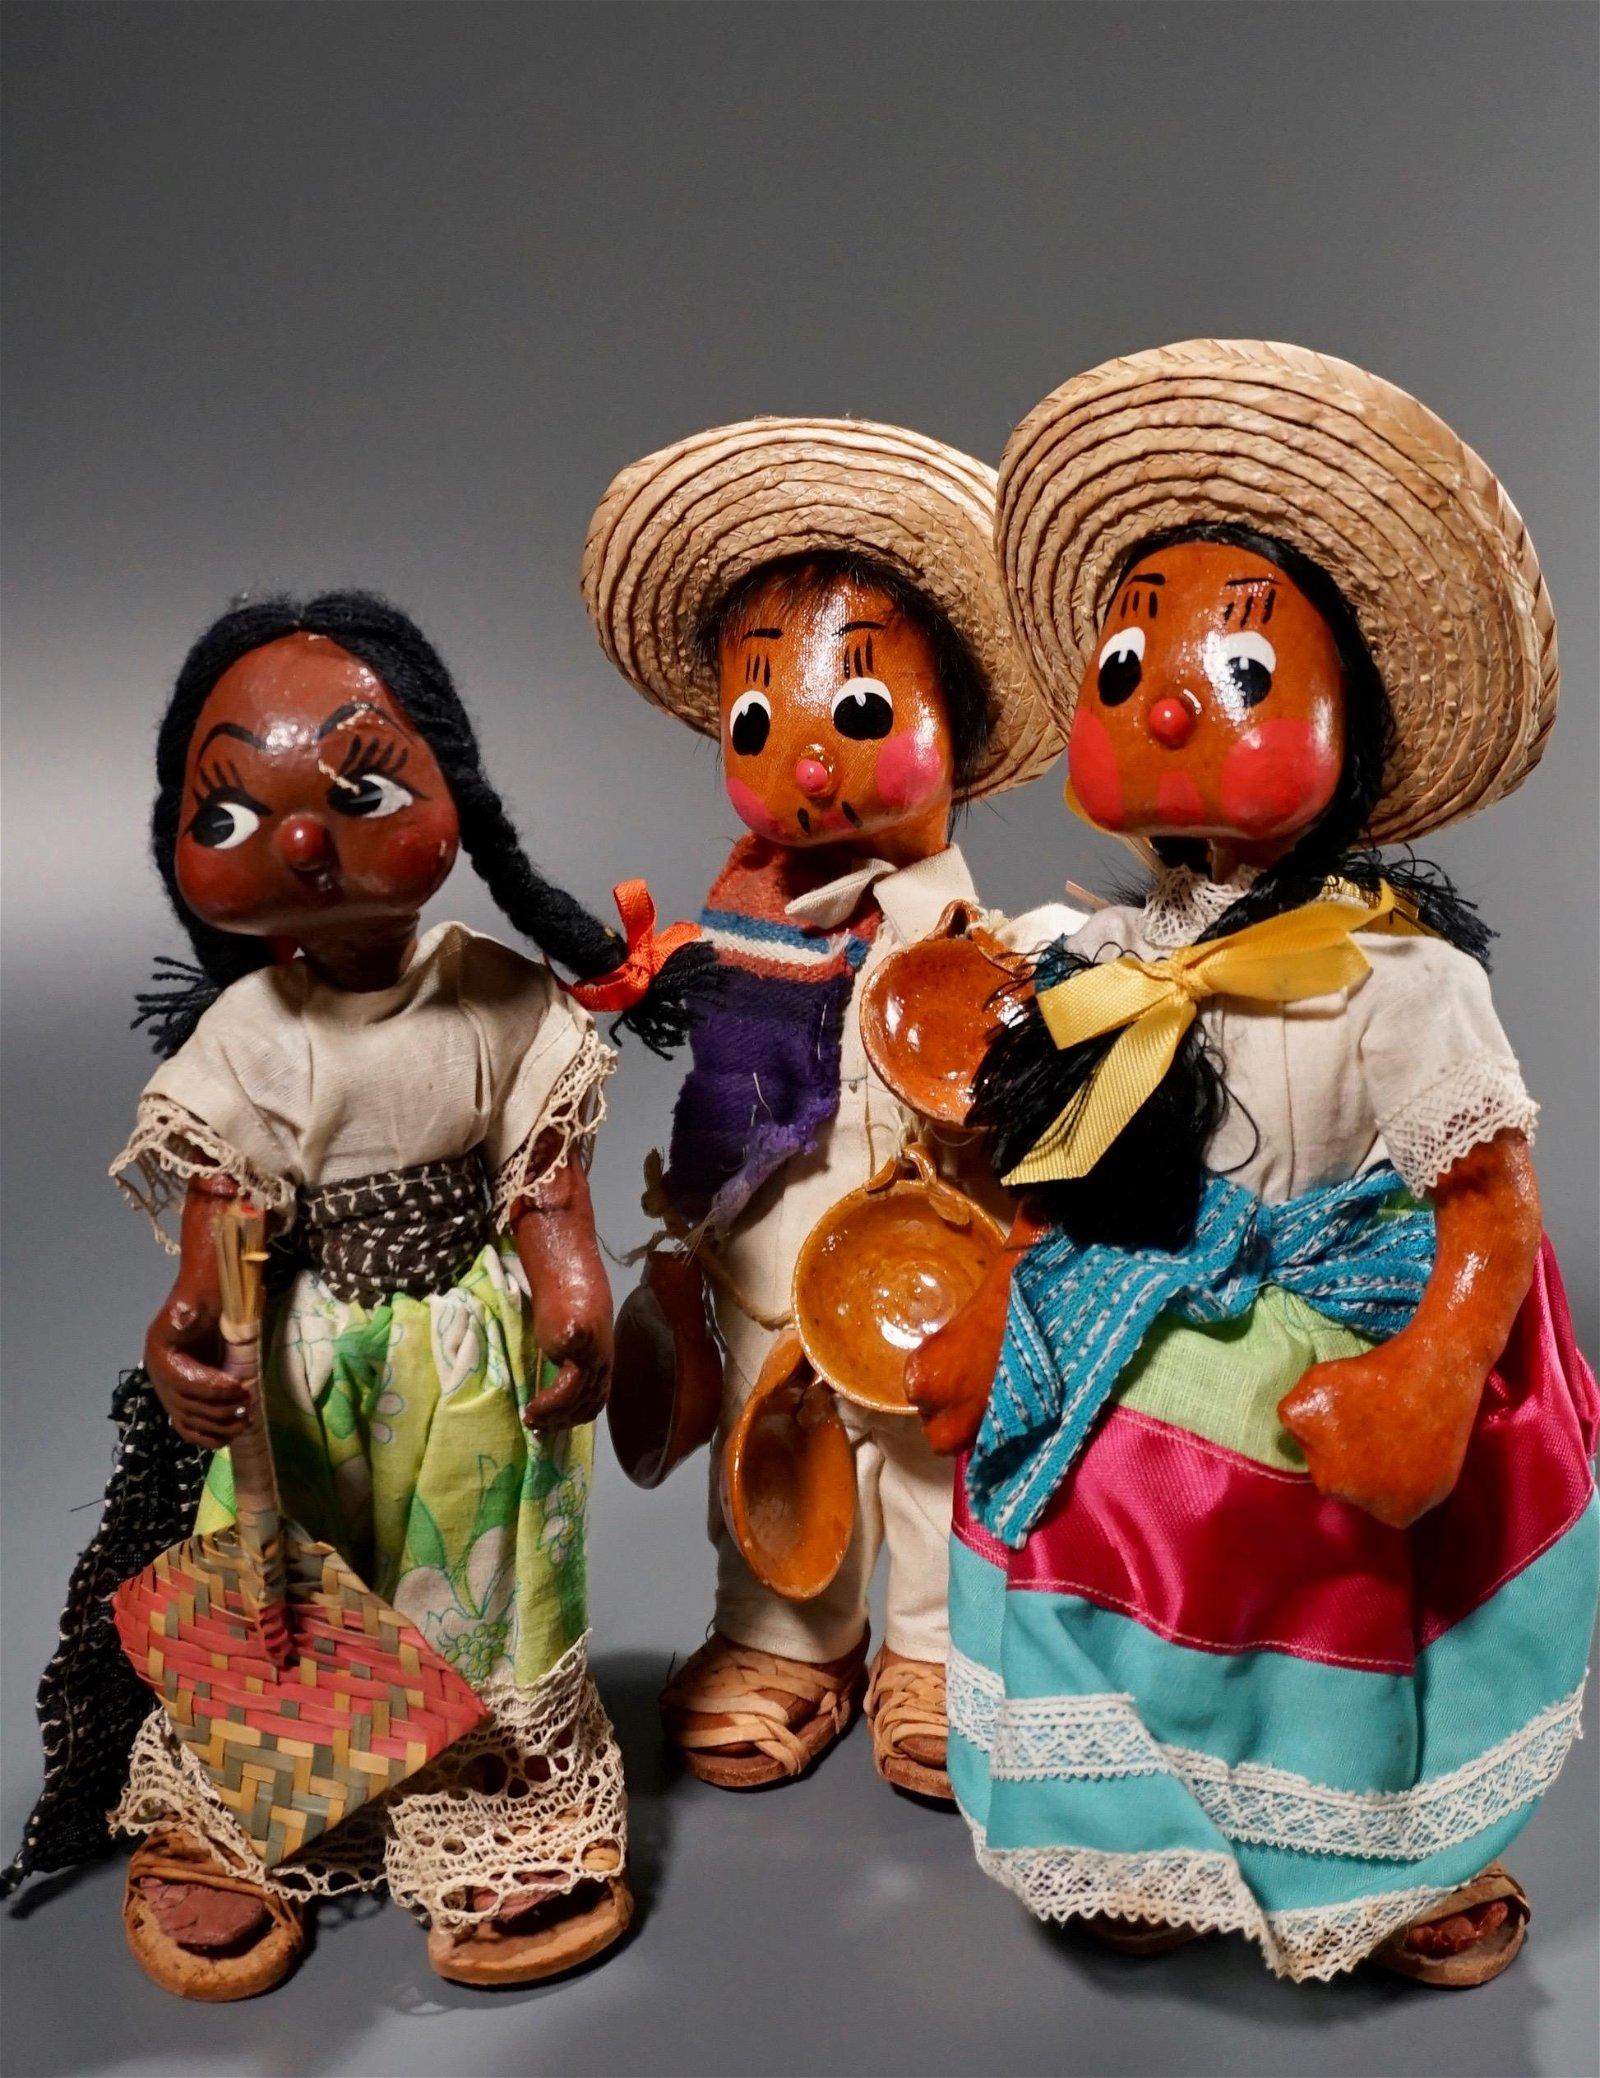 Vintage Mexican Folk Dolls Figurines Lot of 3